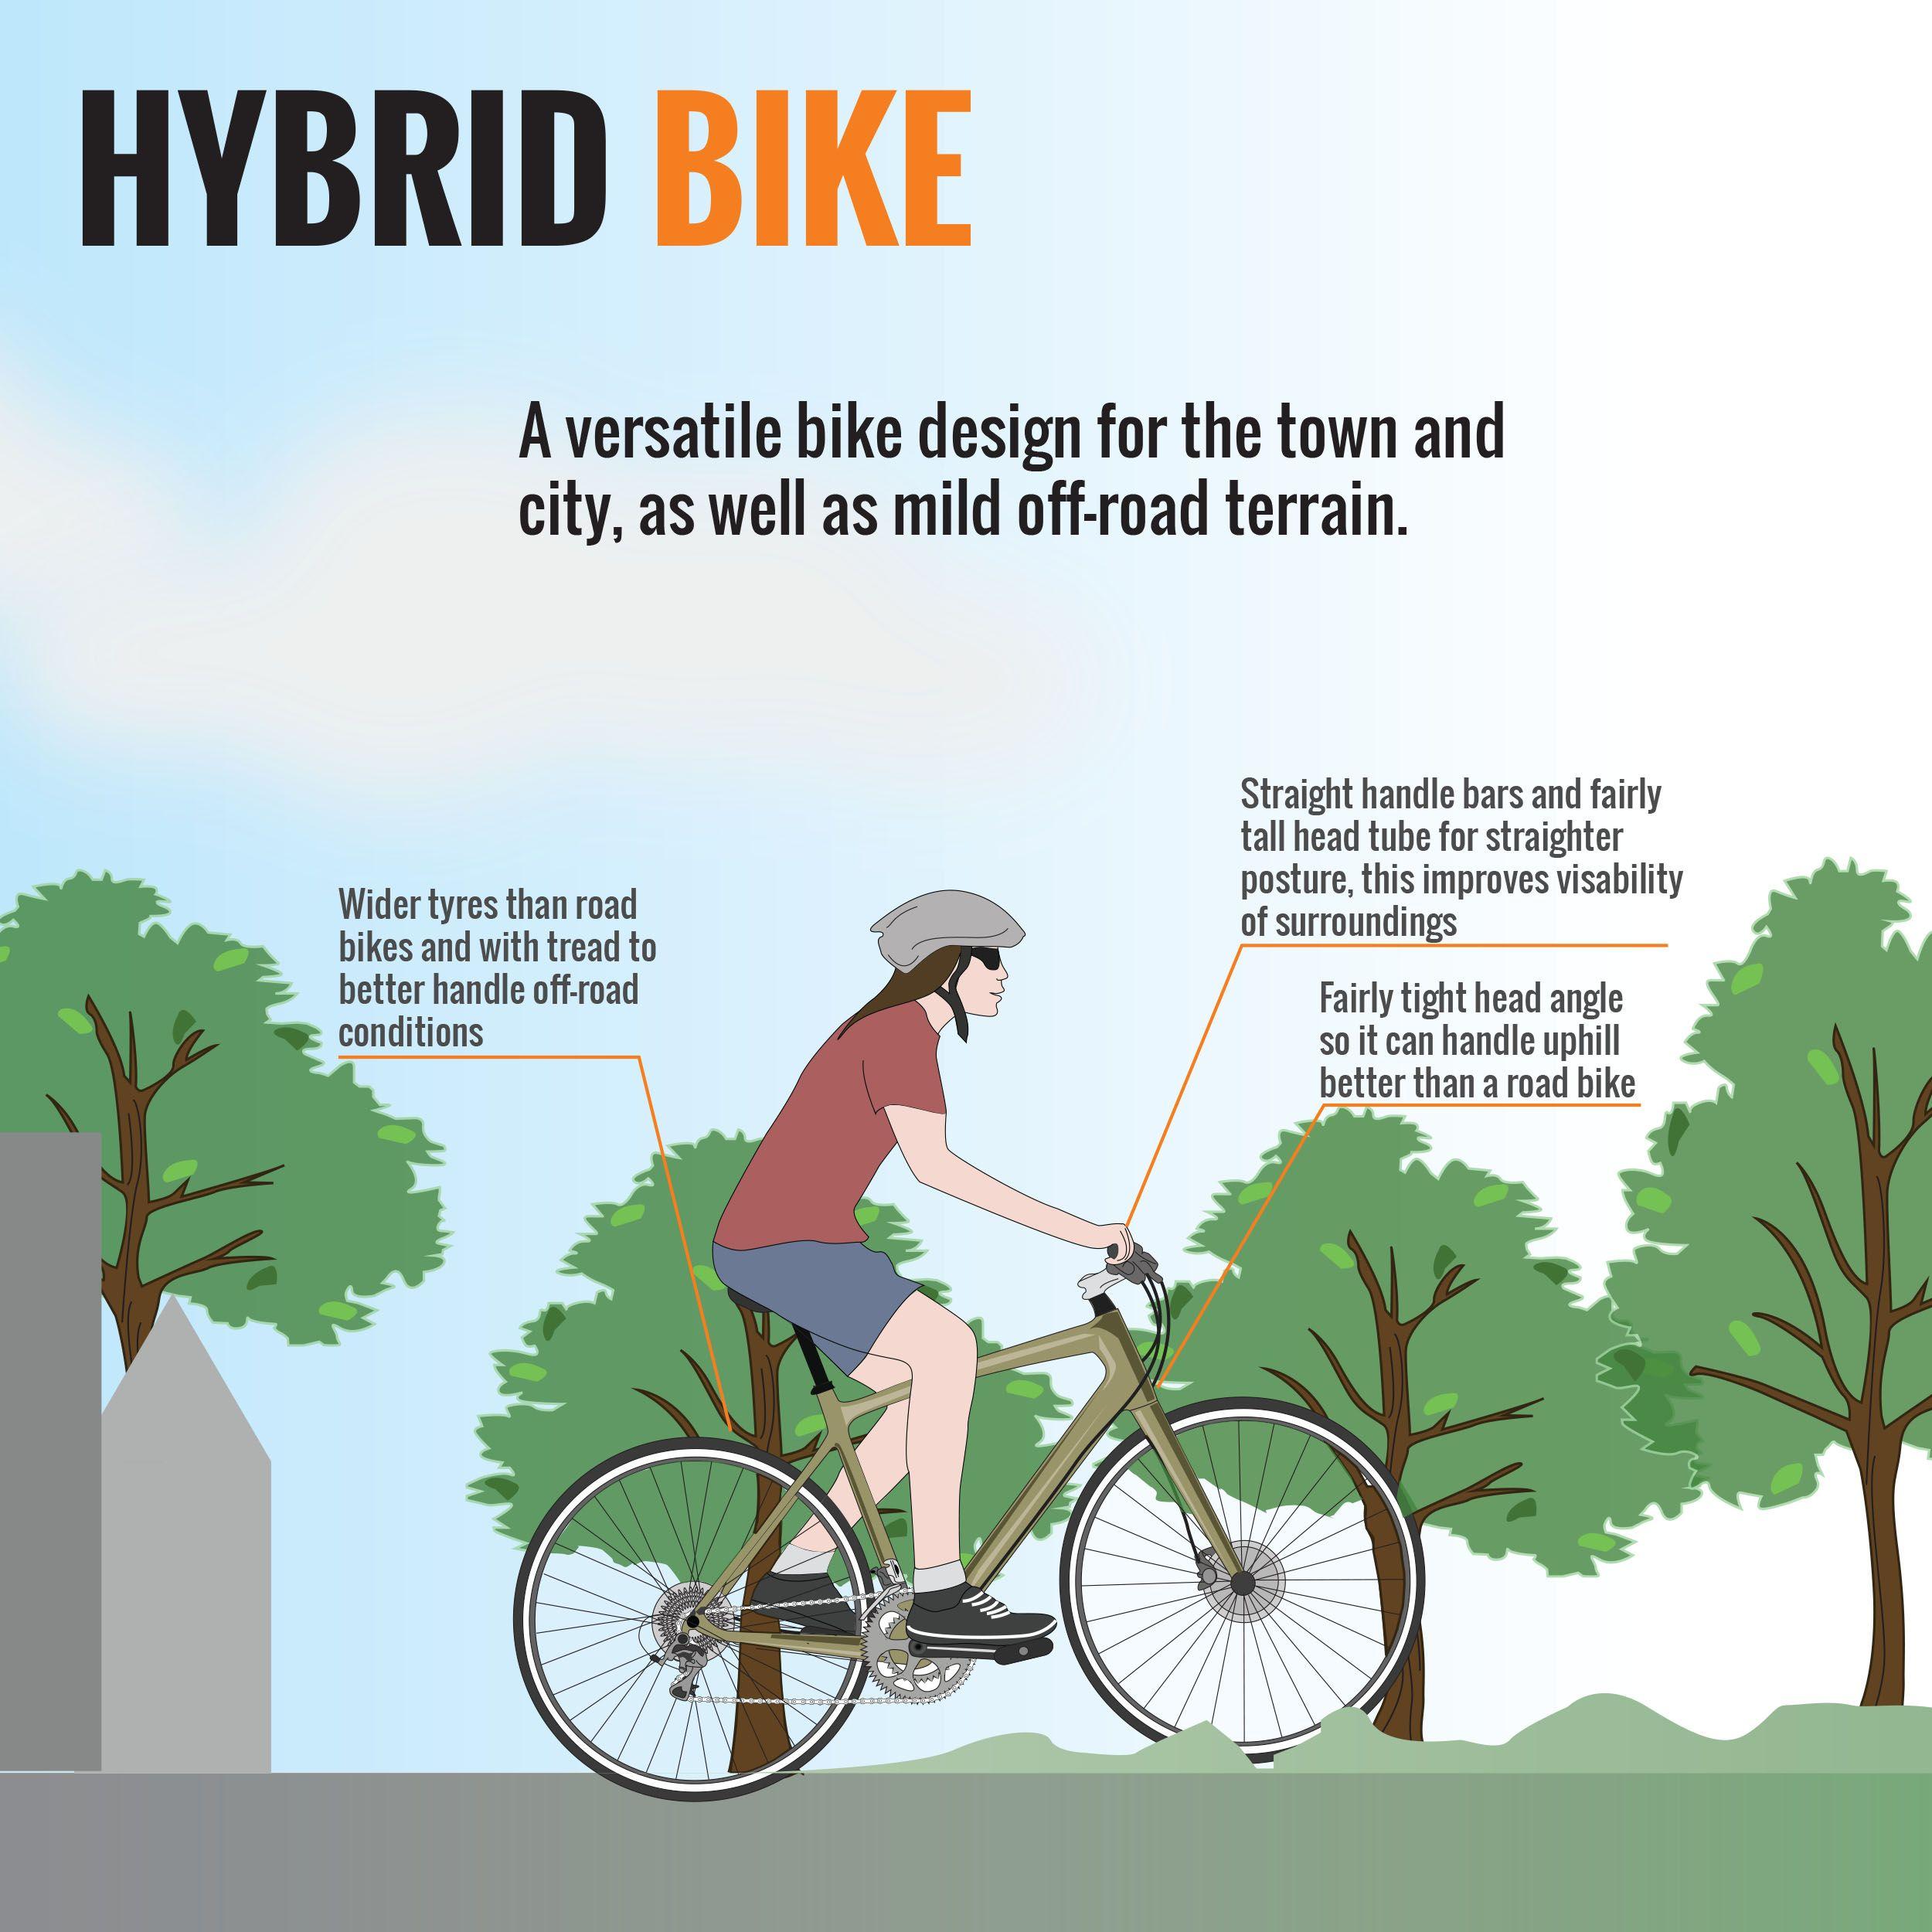 Hybrid Bikes   Choosing the right bicycle   Pinterest   Hybrid bikes ...